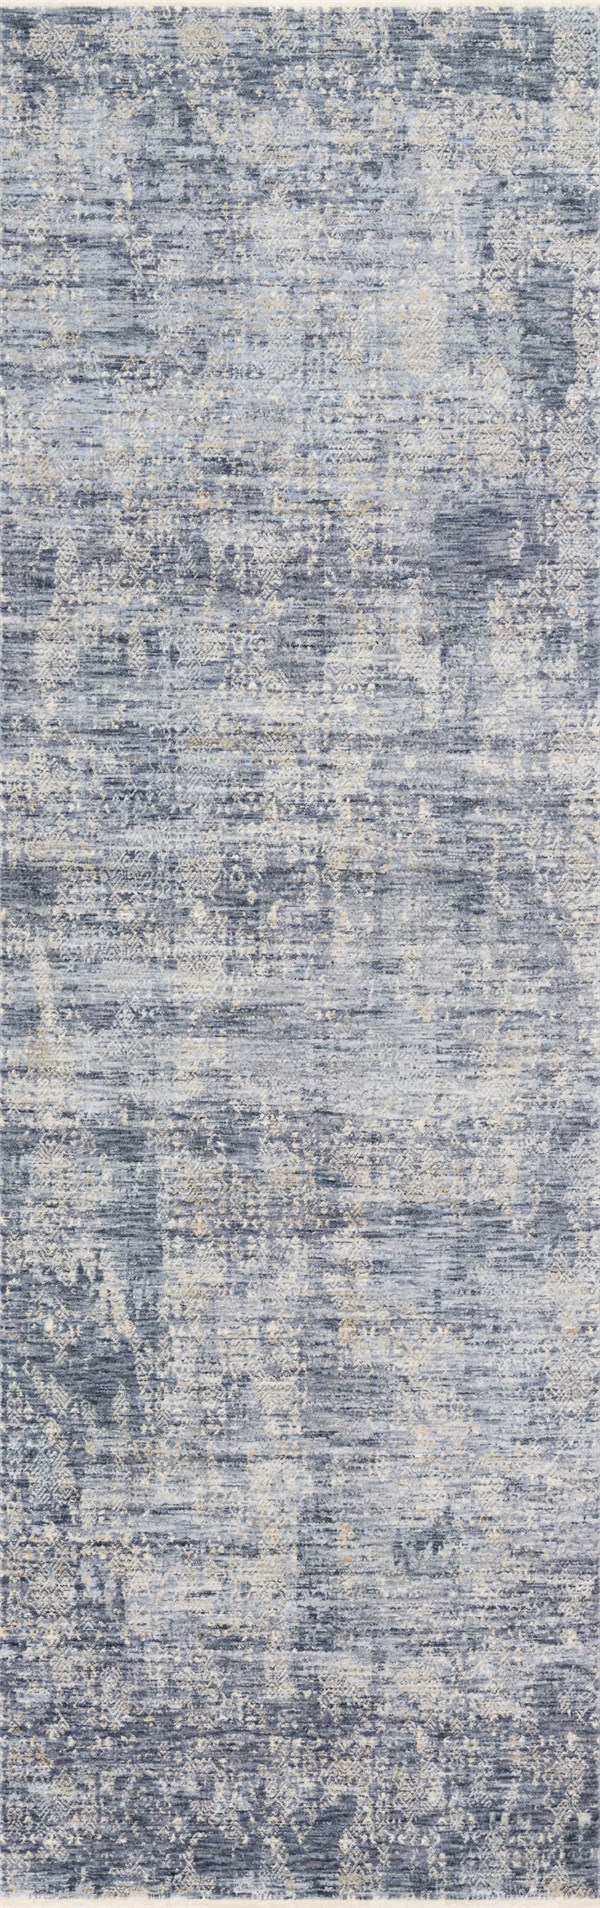 Dark Blue Vintage / Overdyed Area Rug